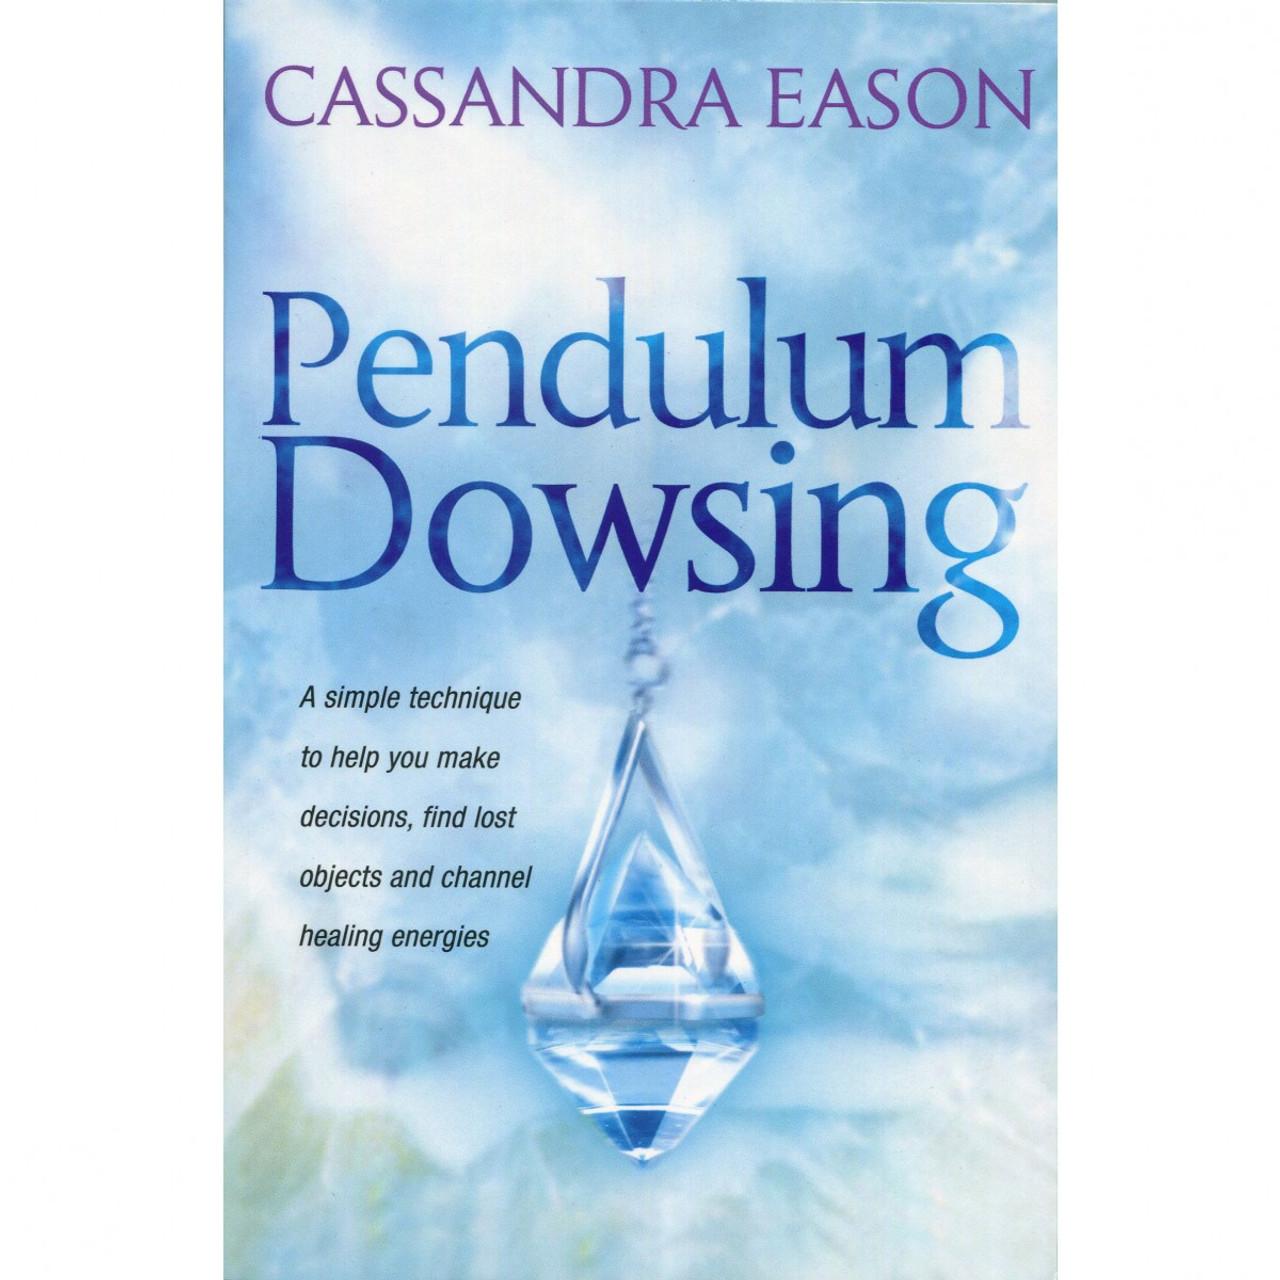 Pendulum Dowsing by Cassandra Eason